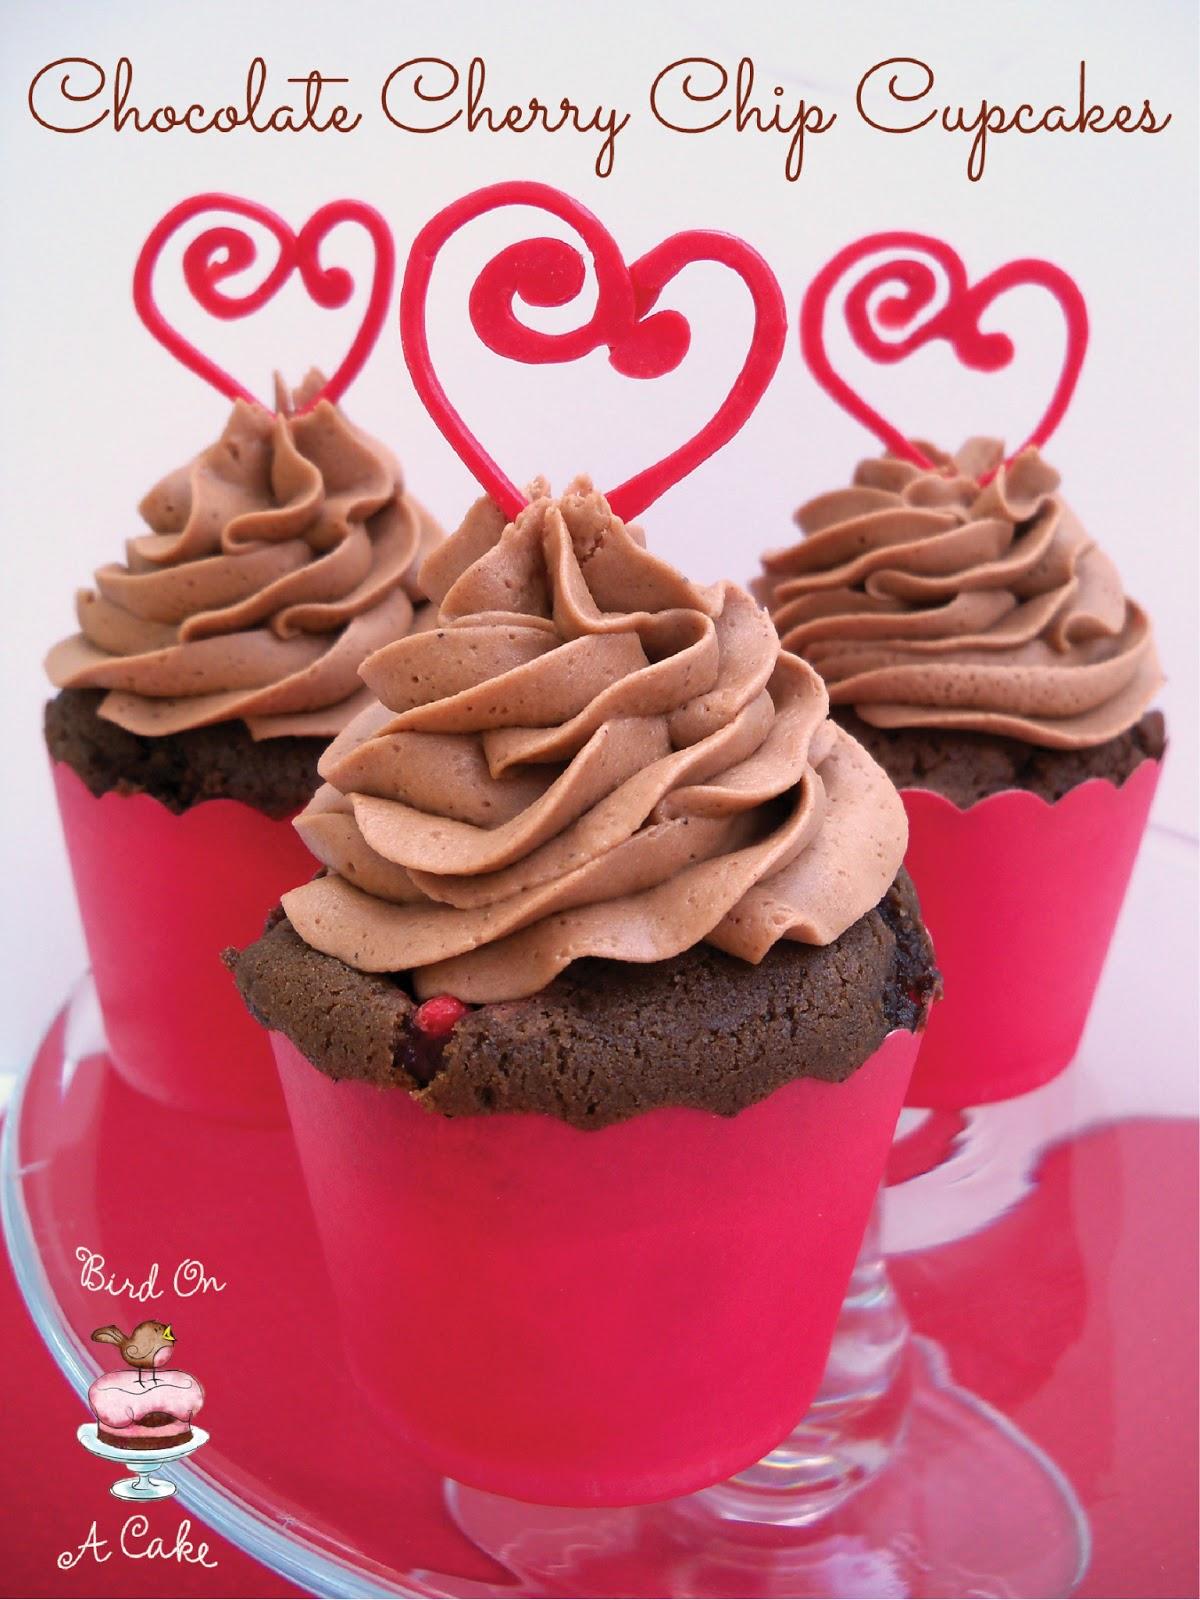 Cherry Chip Cupcake Recipe